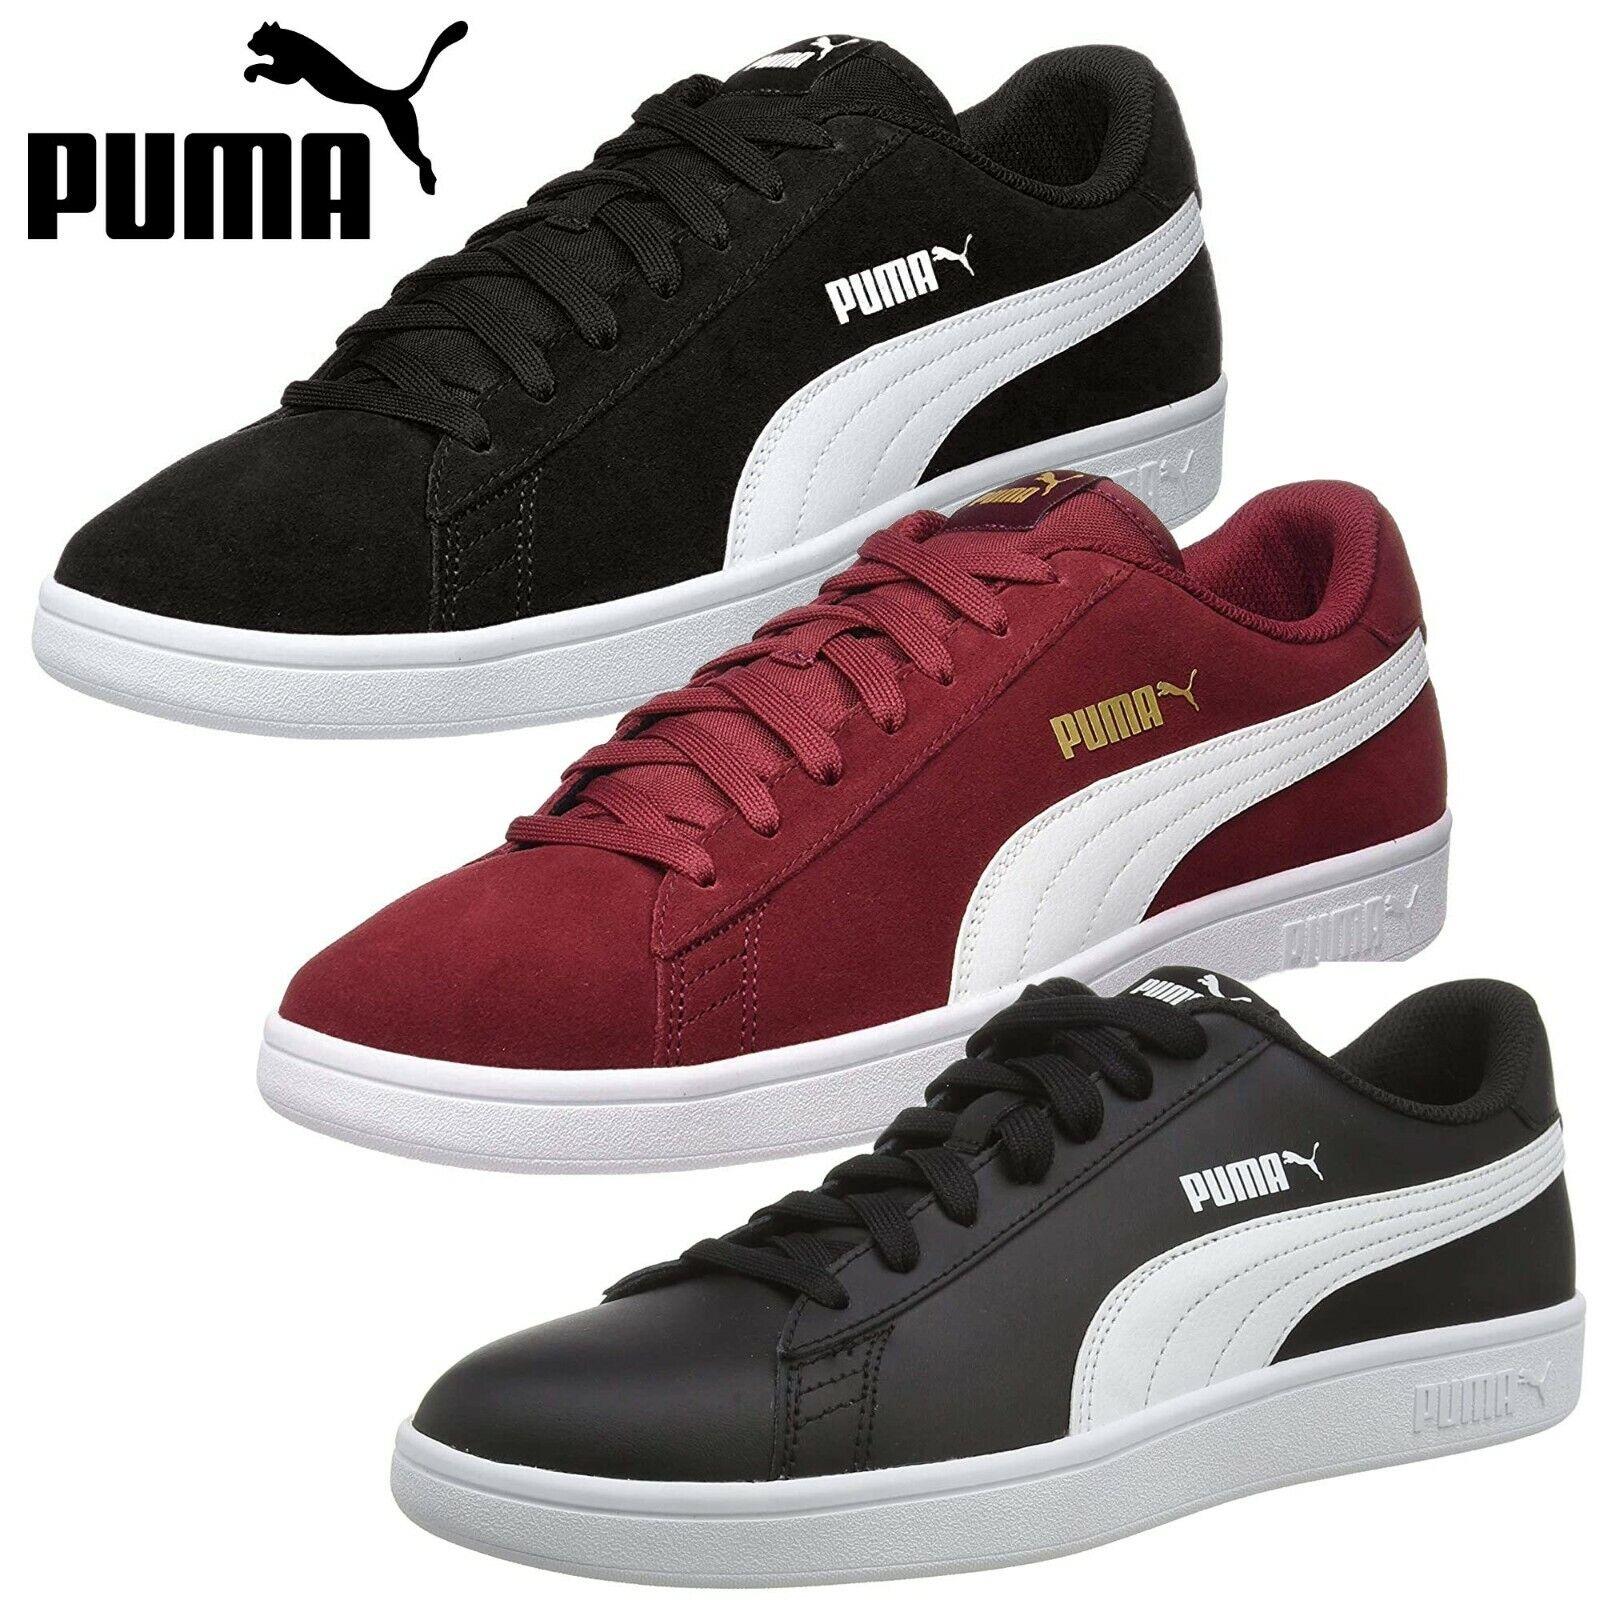 PUMA Smash V2 Leather Suede Men's